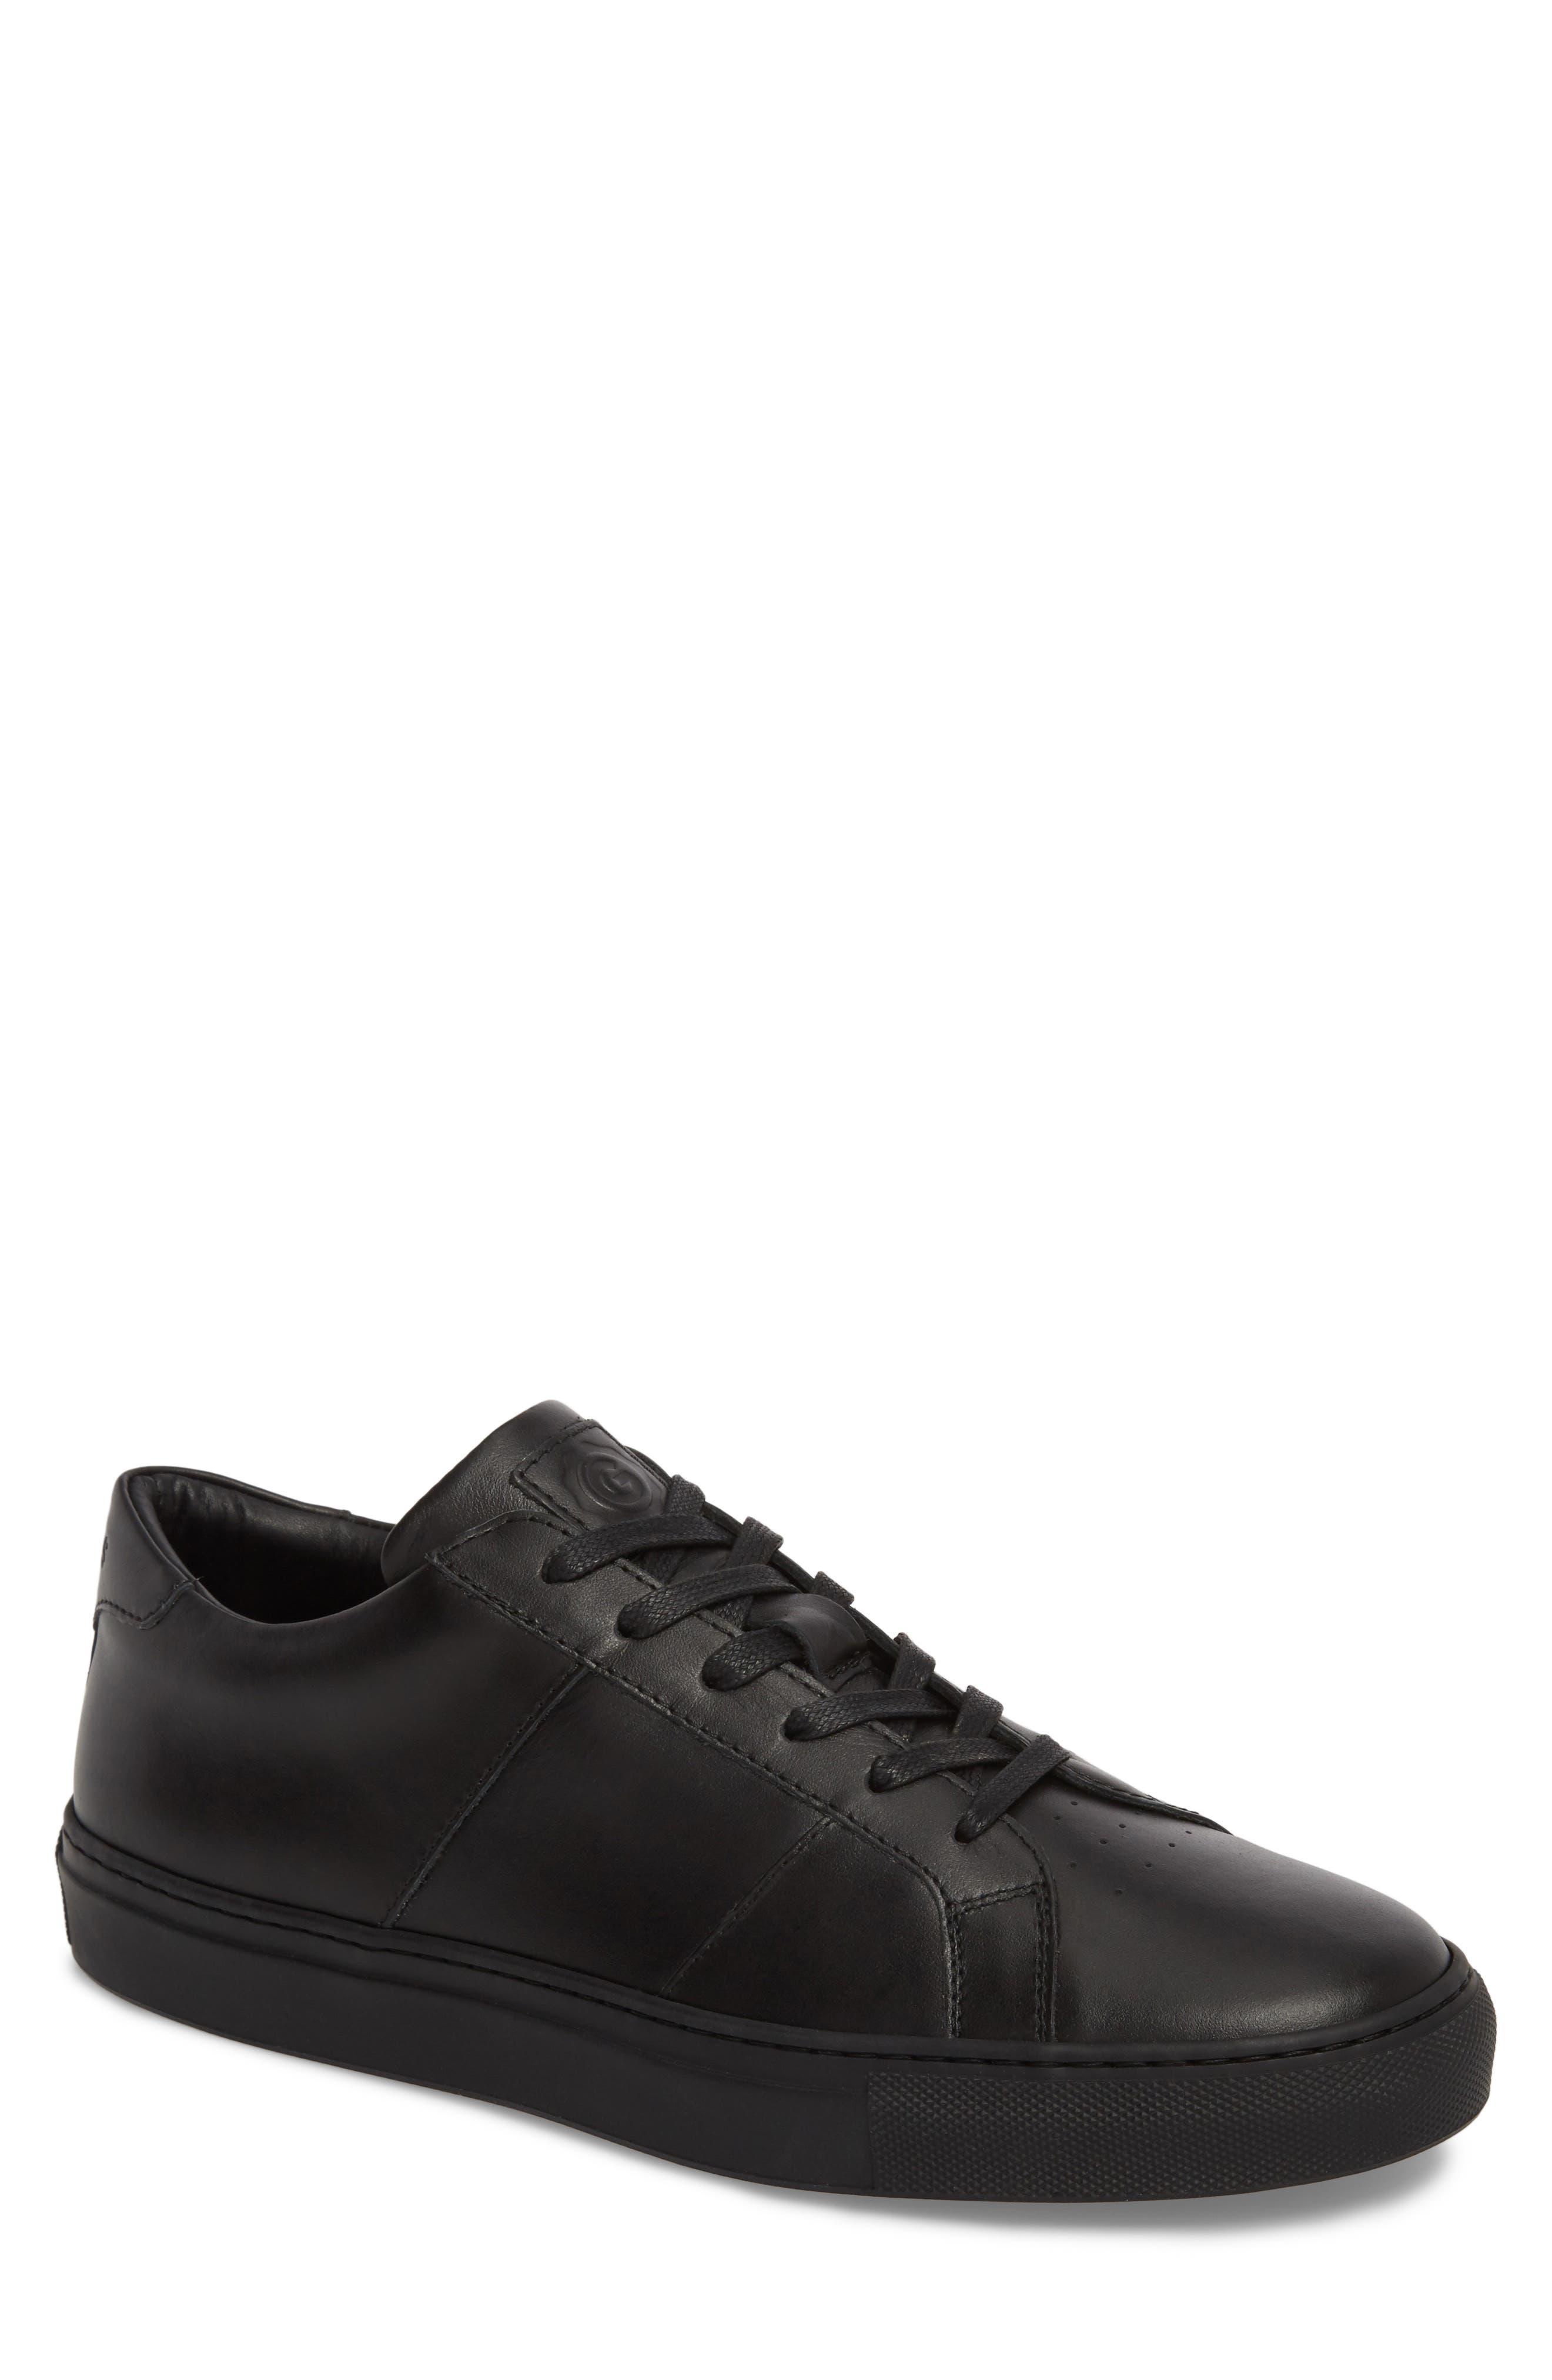 Alternate Image 1 Selected - Greats Royale Sneaker (Men)